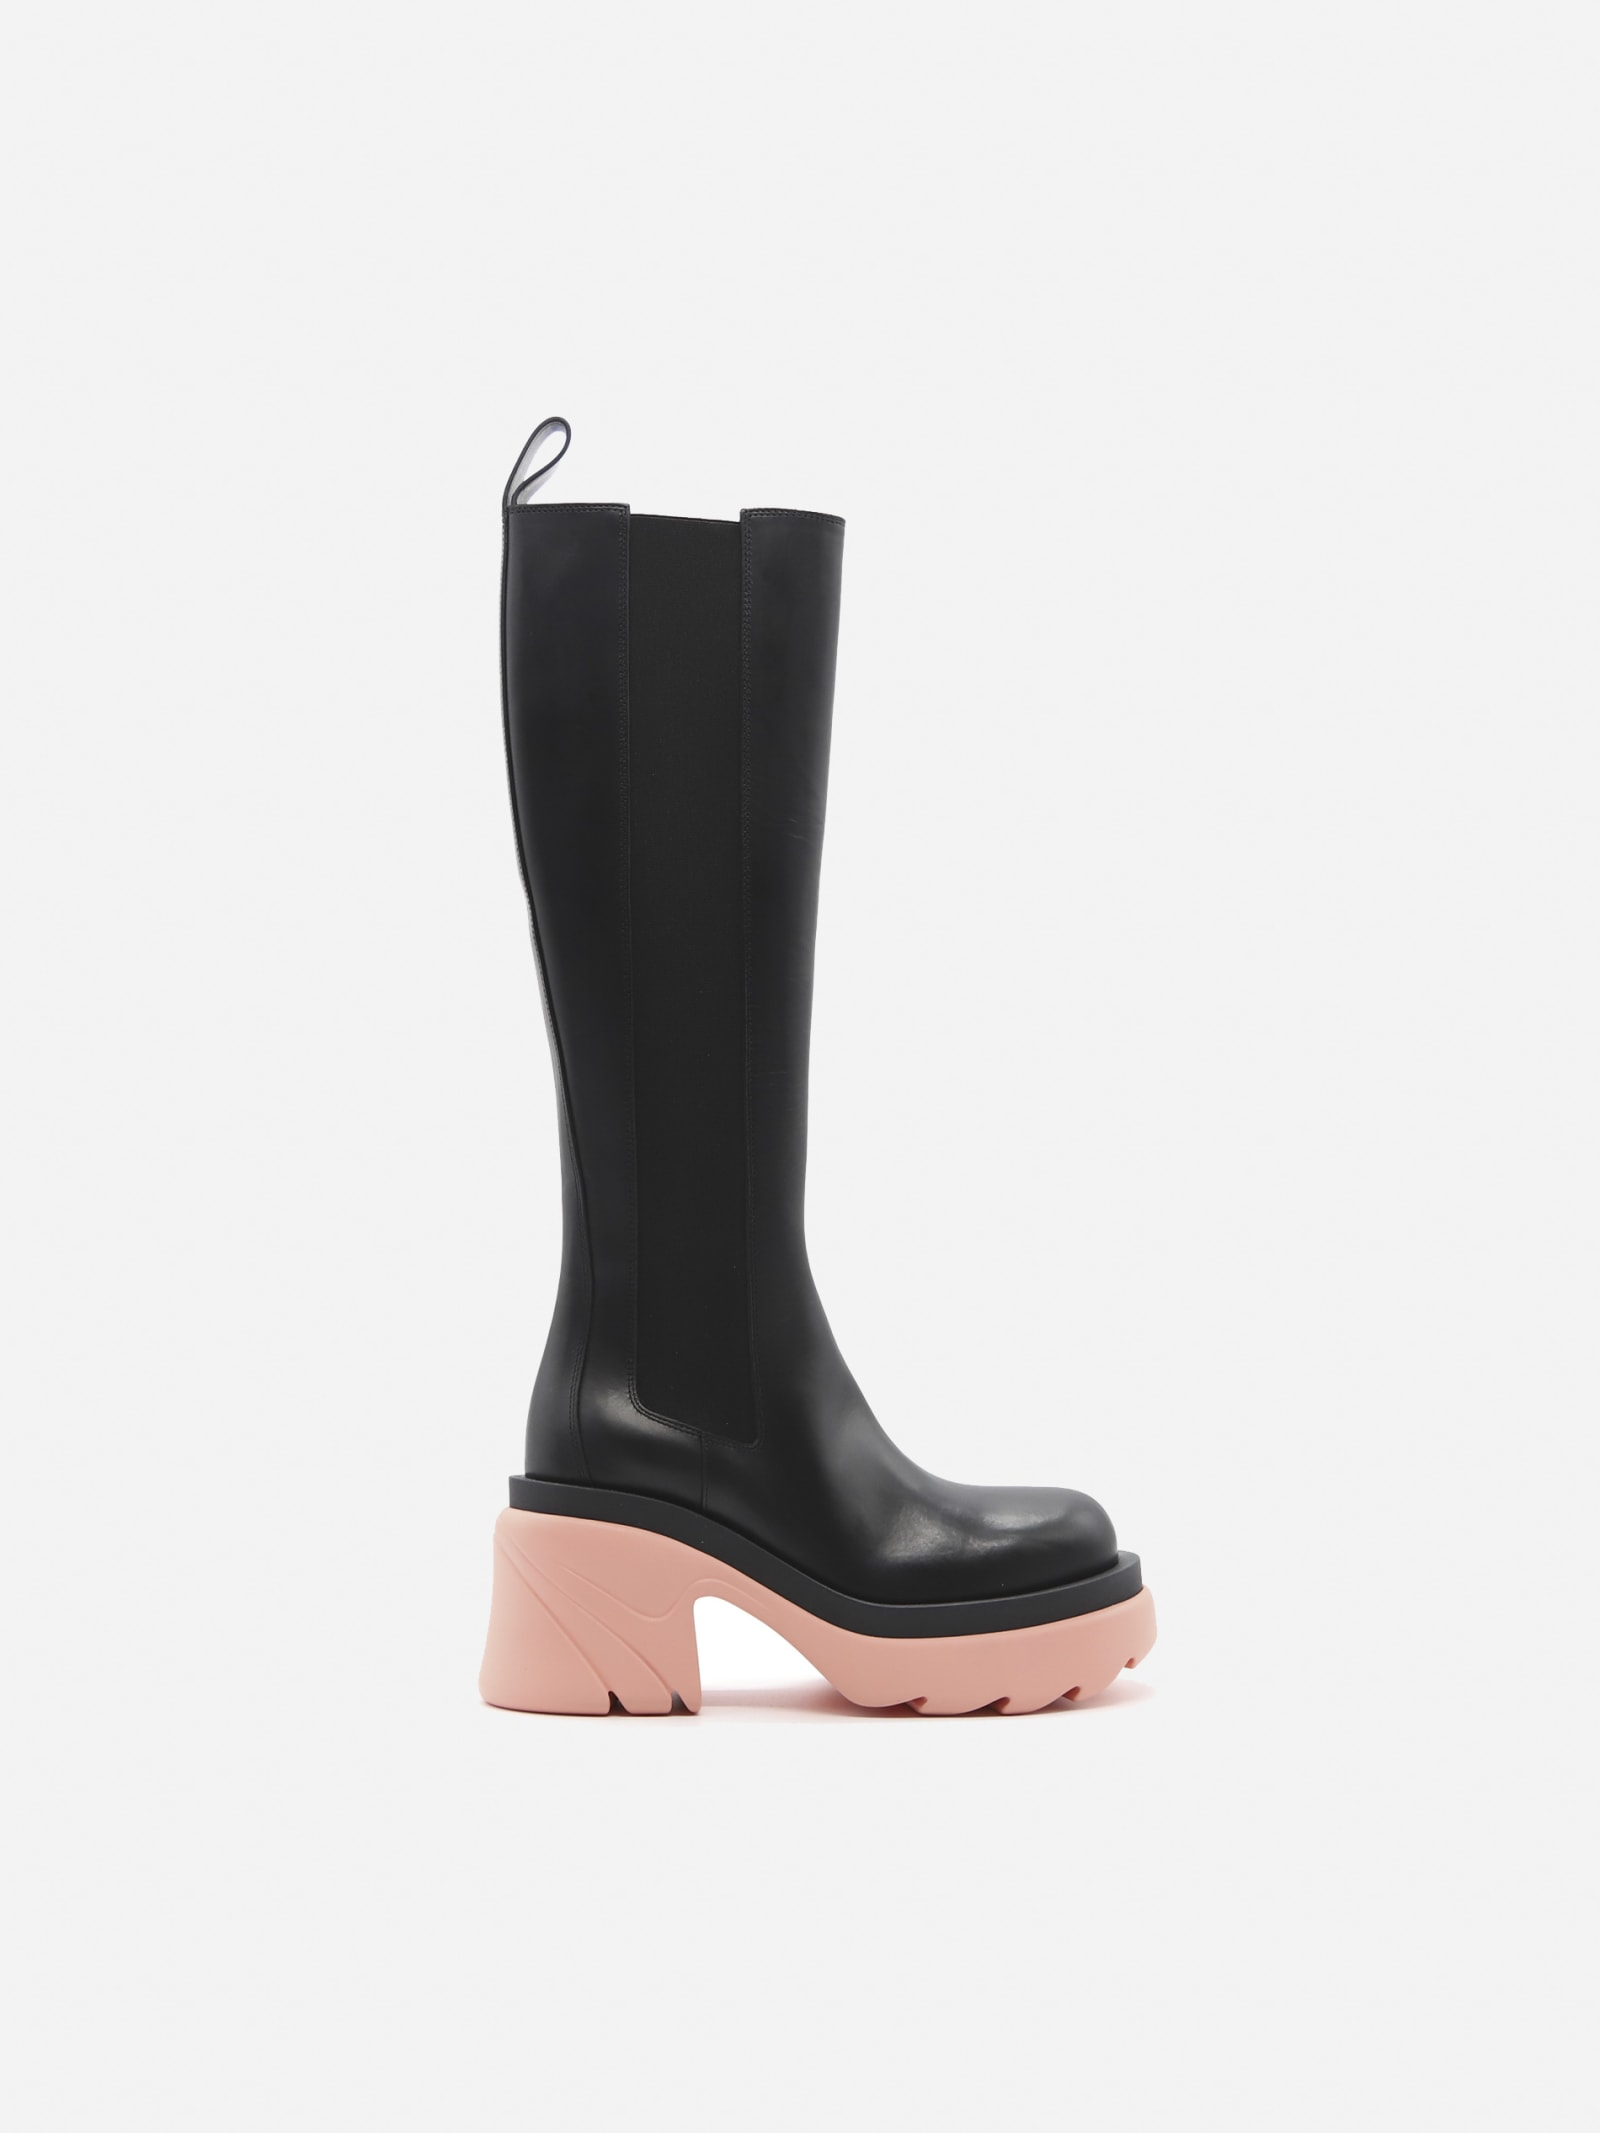 Buy Bottega Veneta Flash Boots Made Of Leather online, shop Bottega Veneta shoes with free shipping